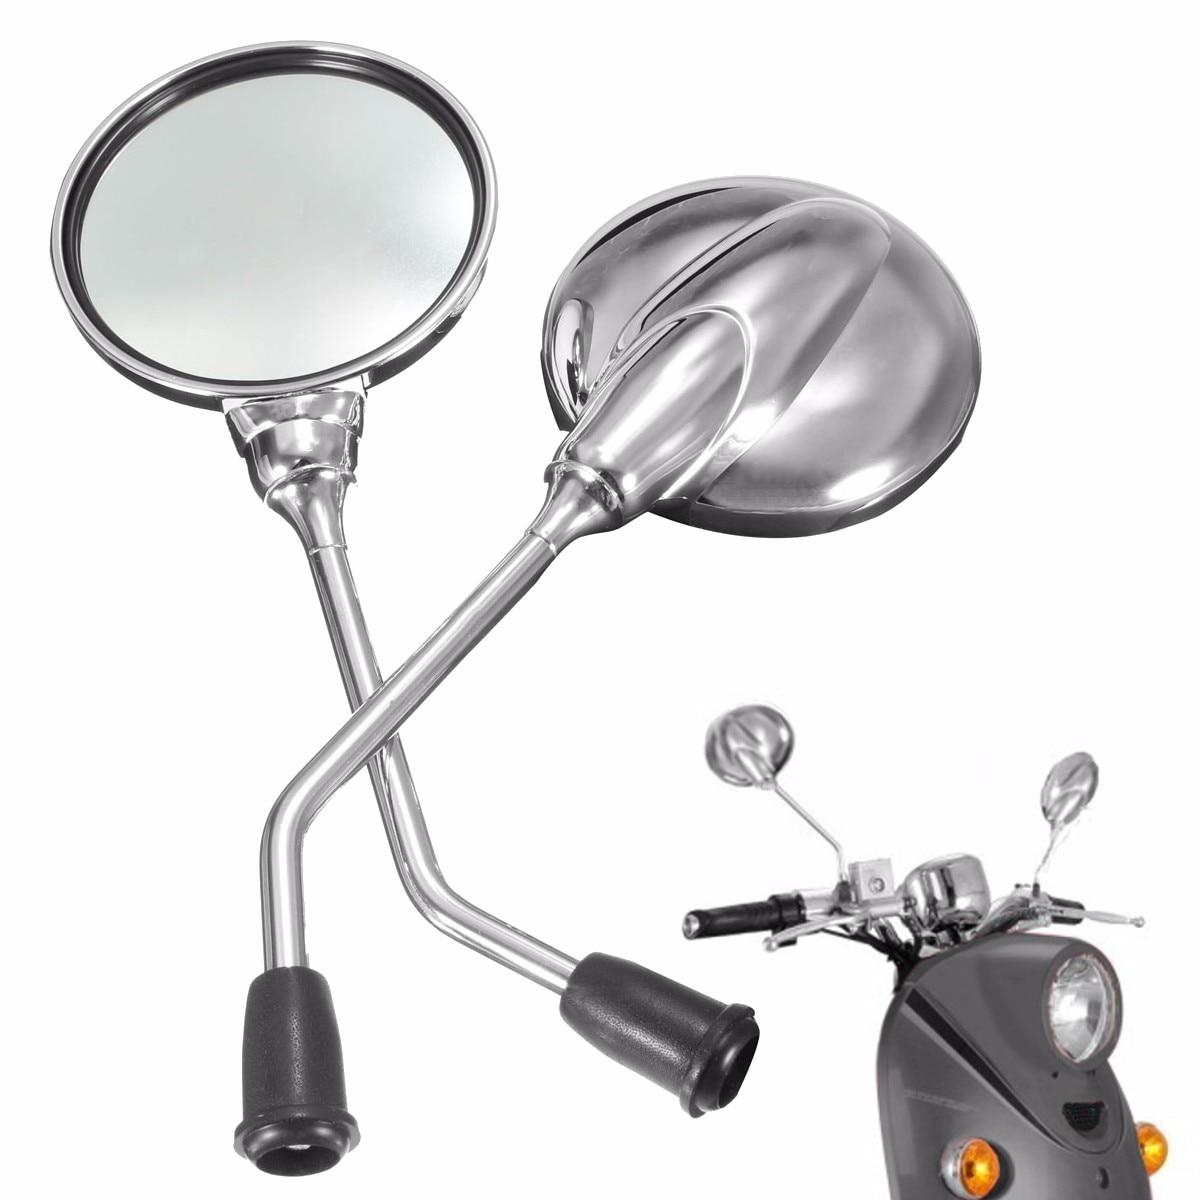 1 пара, хромированное зеркало заднего вида для мотоцикла, заднего вида, 8 мм, круглое